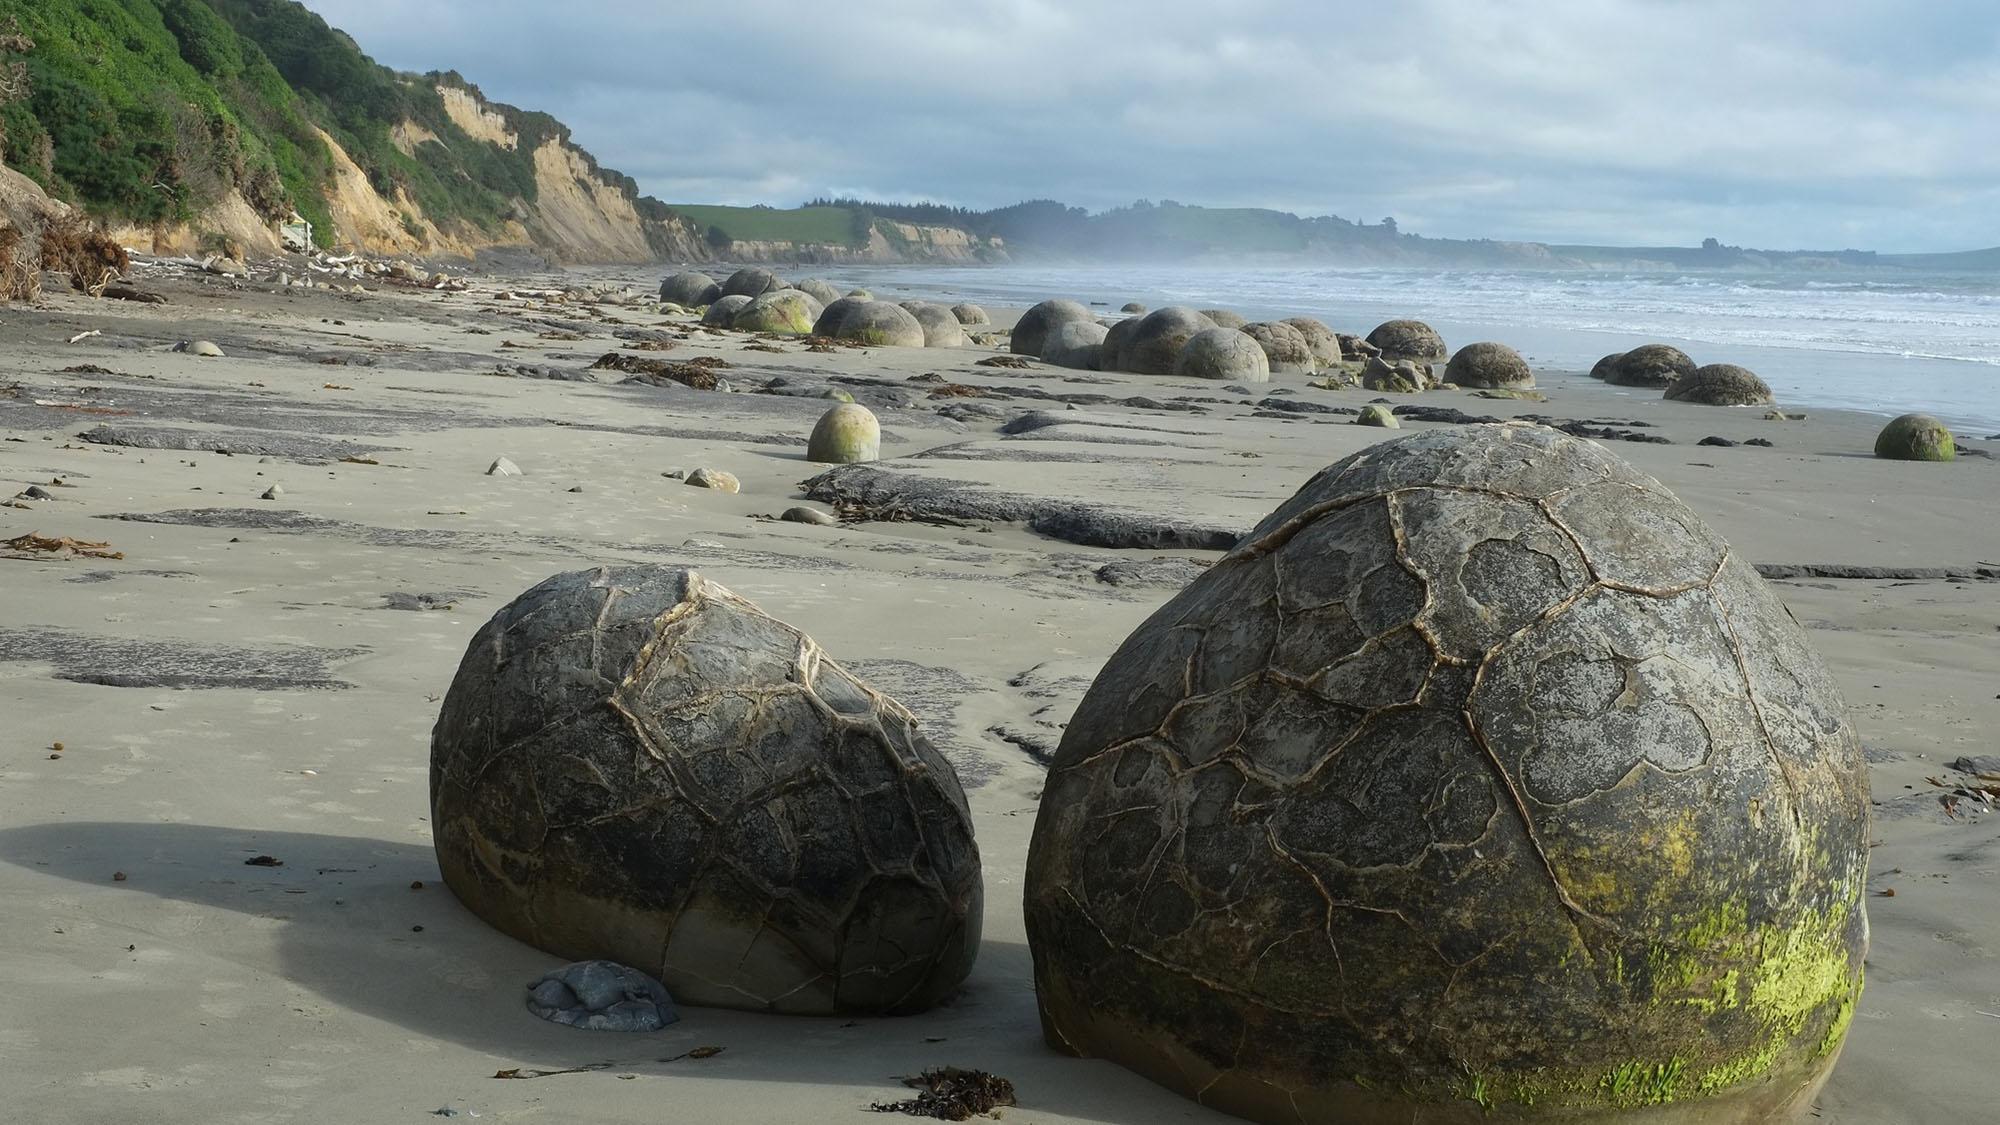 nz2-Devoyager-P-boulders17